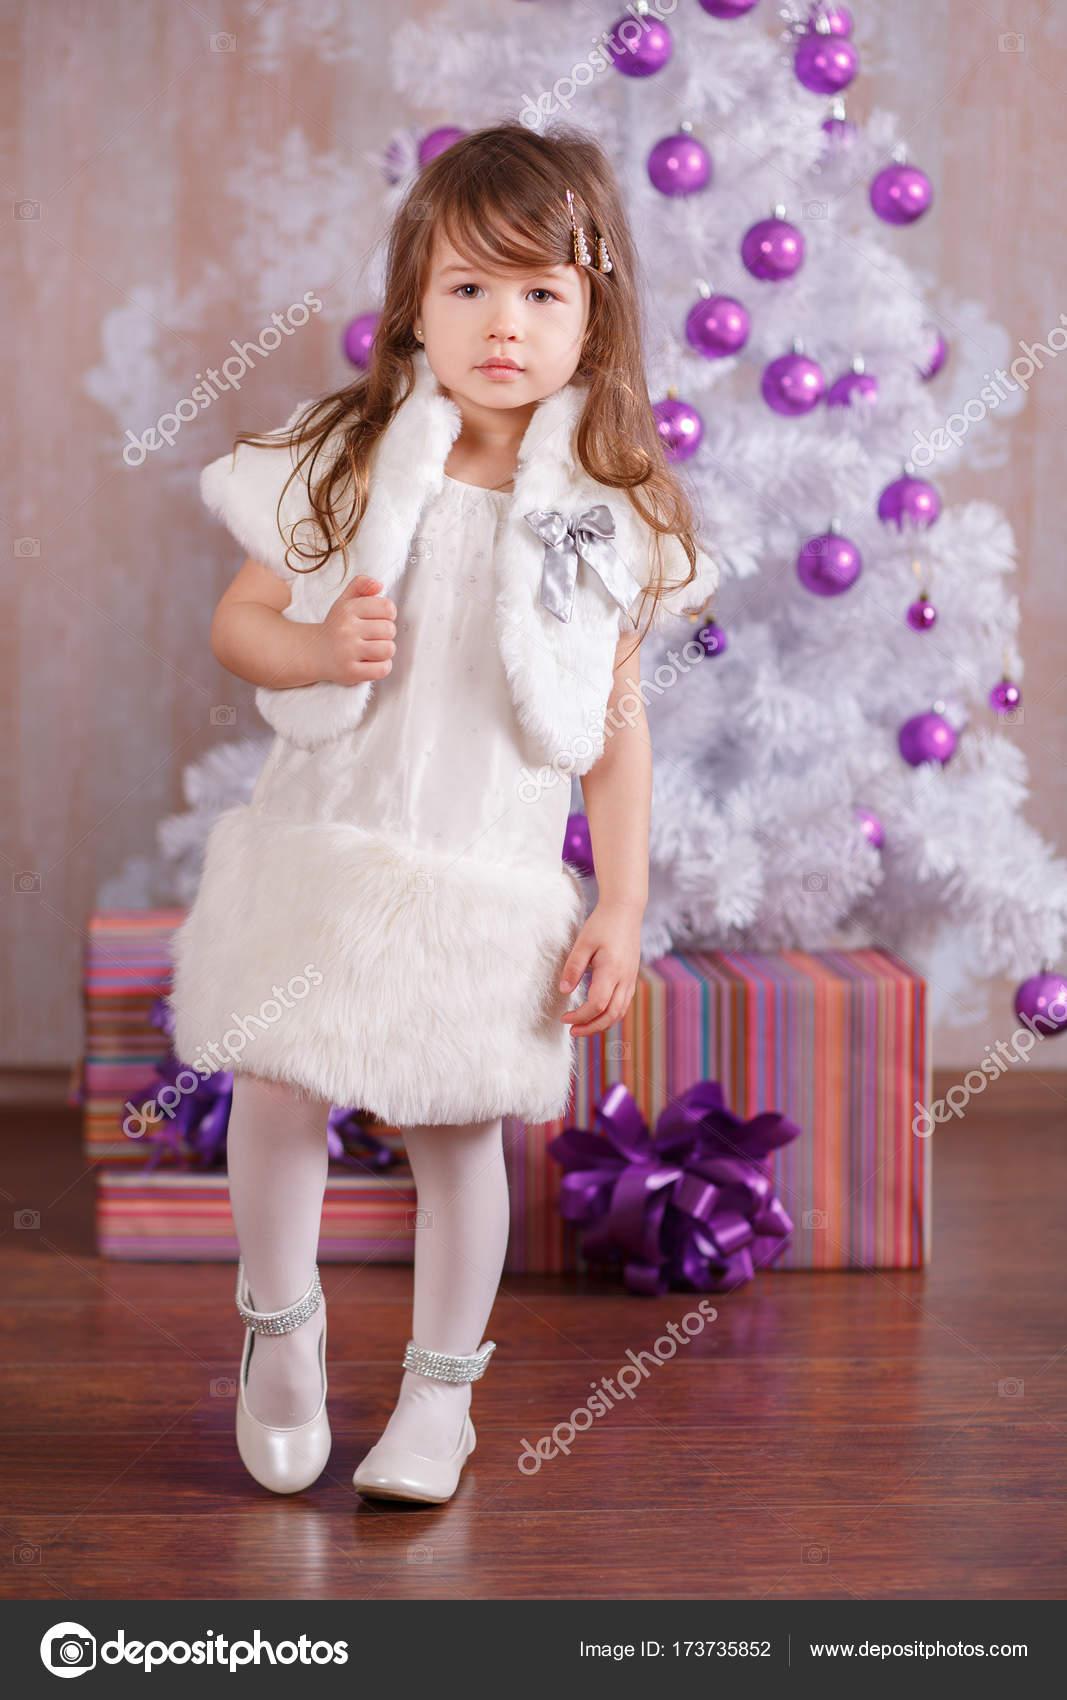 c65822ad93d Νεαρή μελαχρινή κουκλίτσα κυρία κορίτσι κομψά ντυμένοι σε ζεστό ...